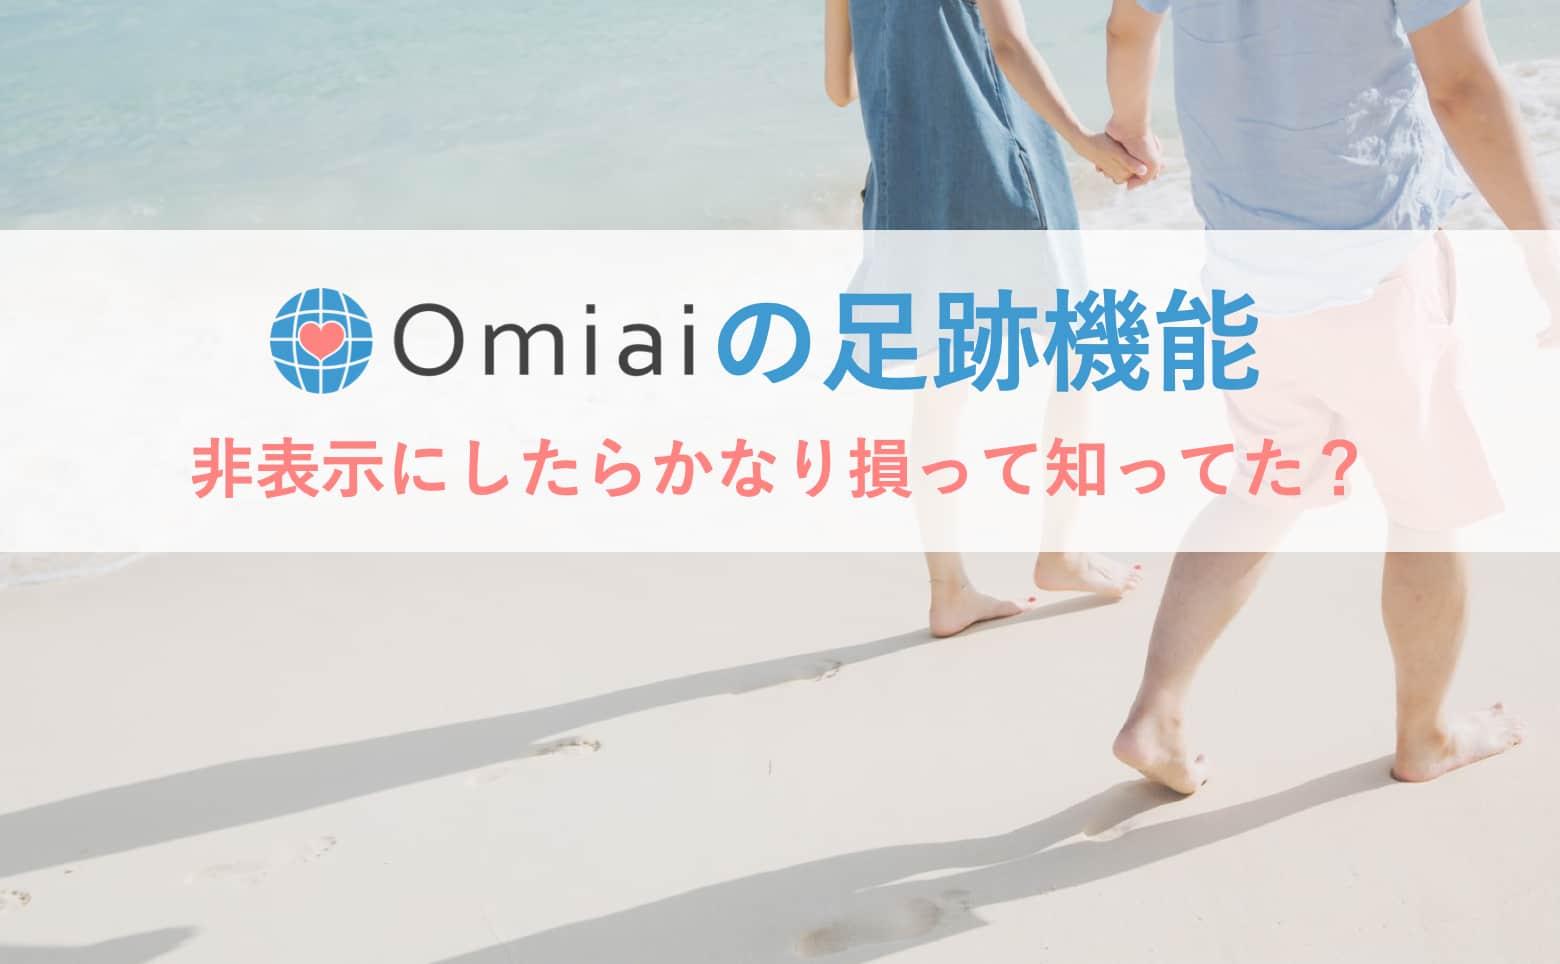 Omiai足跡記事アイキャッチ